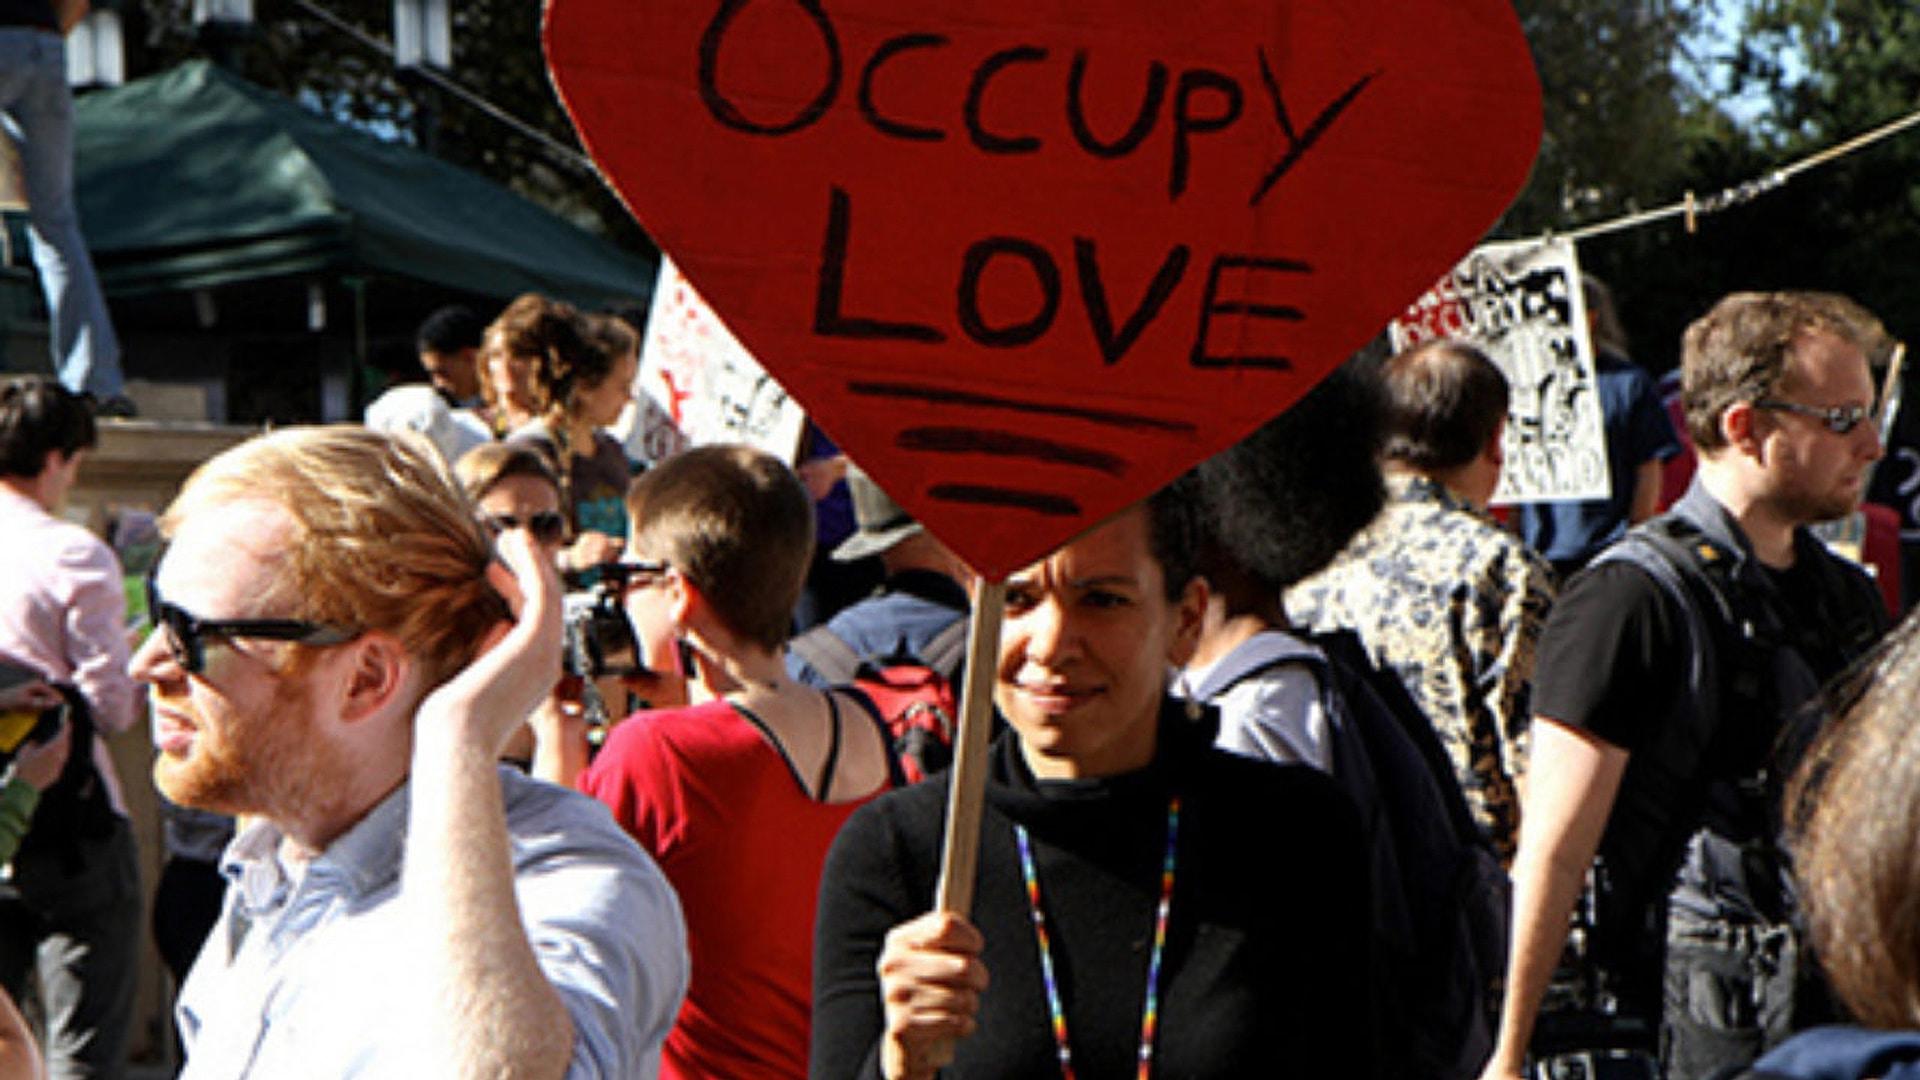 Still from Occupy Love